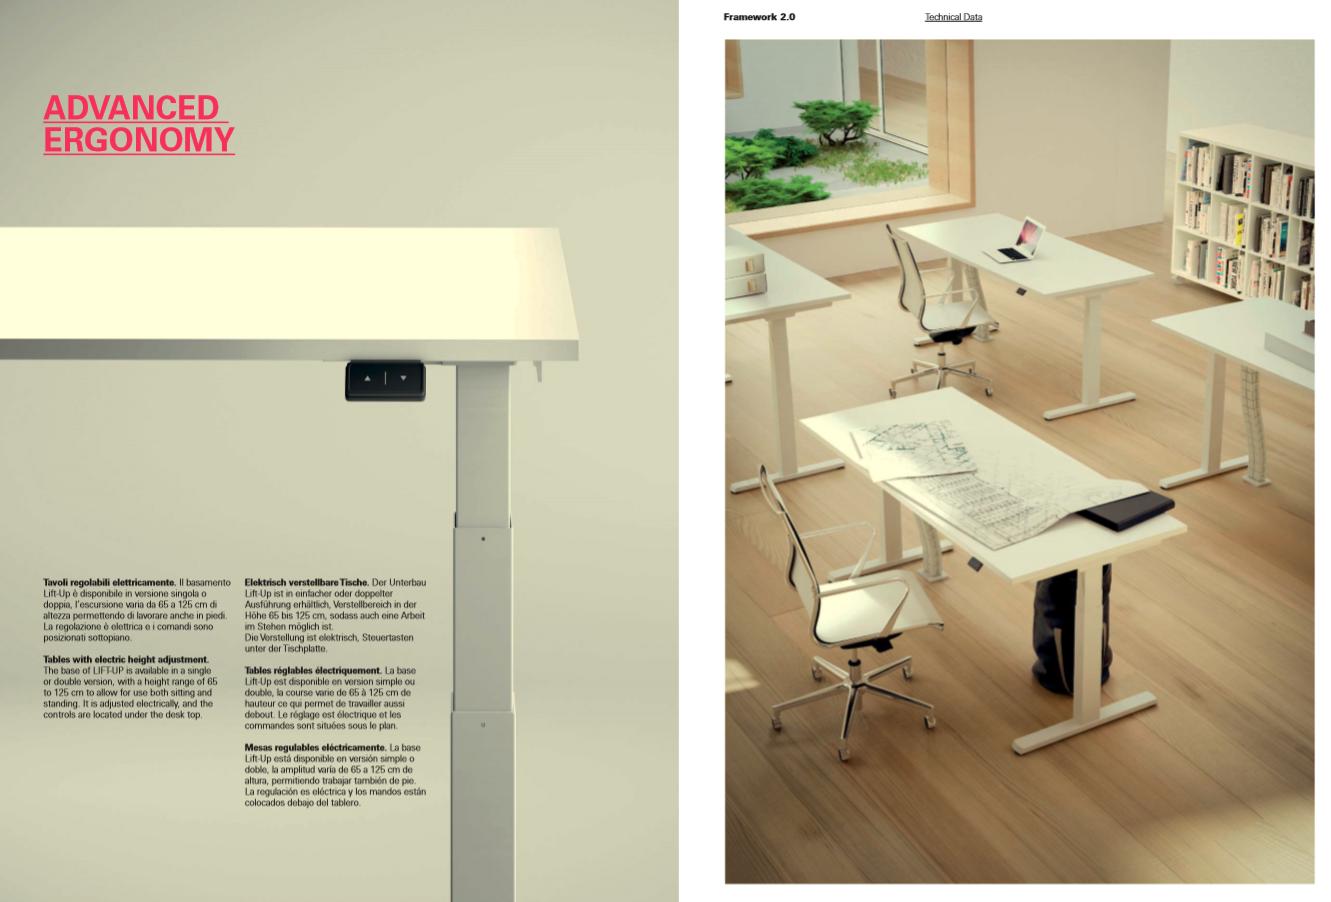 Fantoni Framework 2.0 Kollektion Das innovative Konzept und des ...